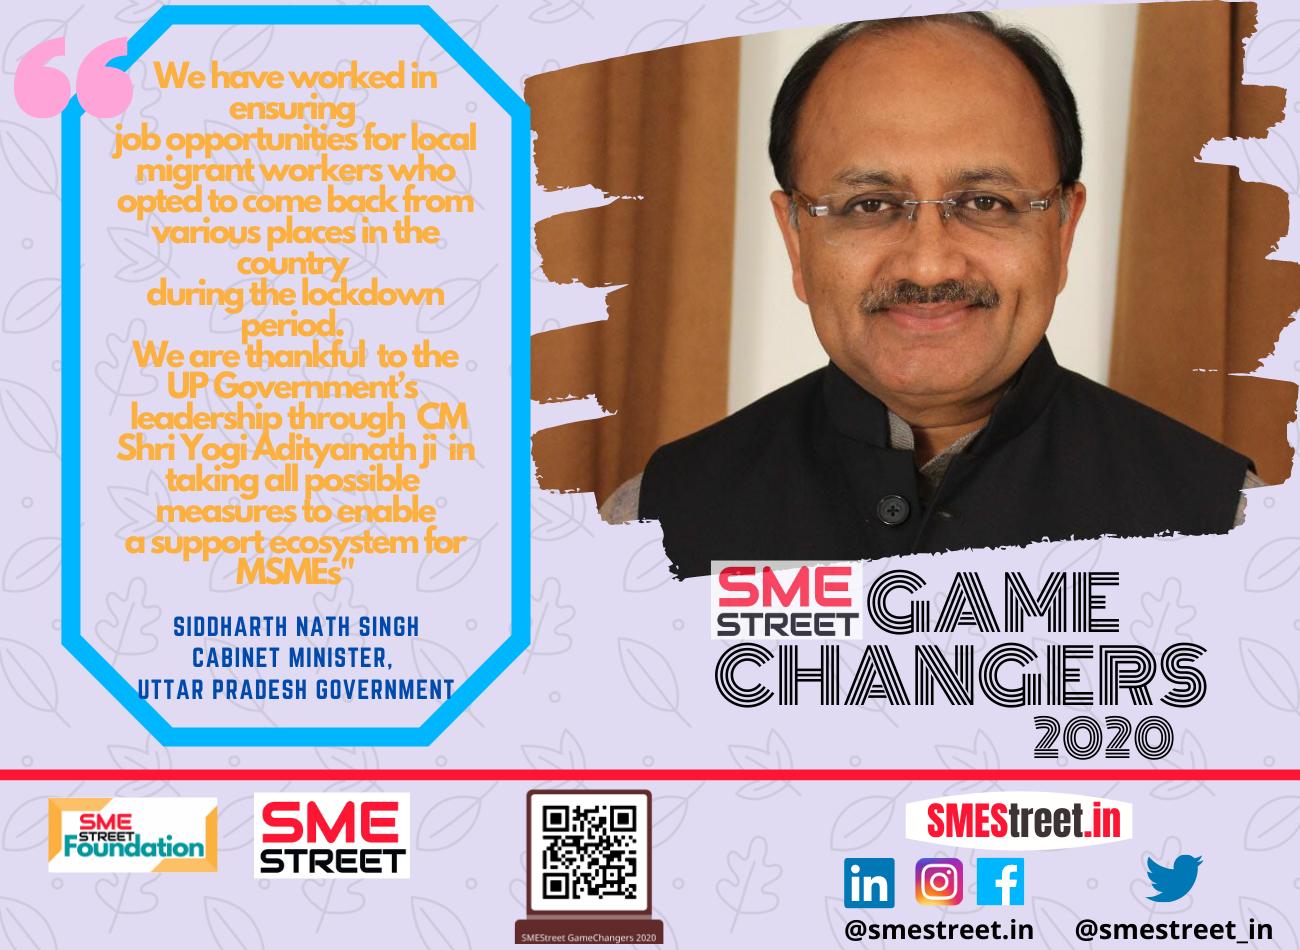 Meet Siddharth Nath Singh MSME Minister of UP Govt as SMEStreet GameChanger